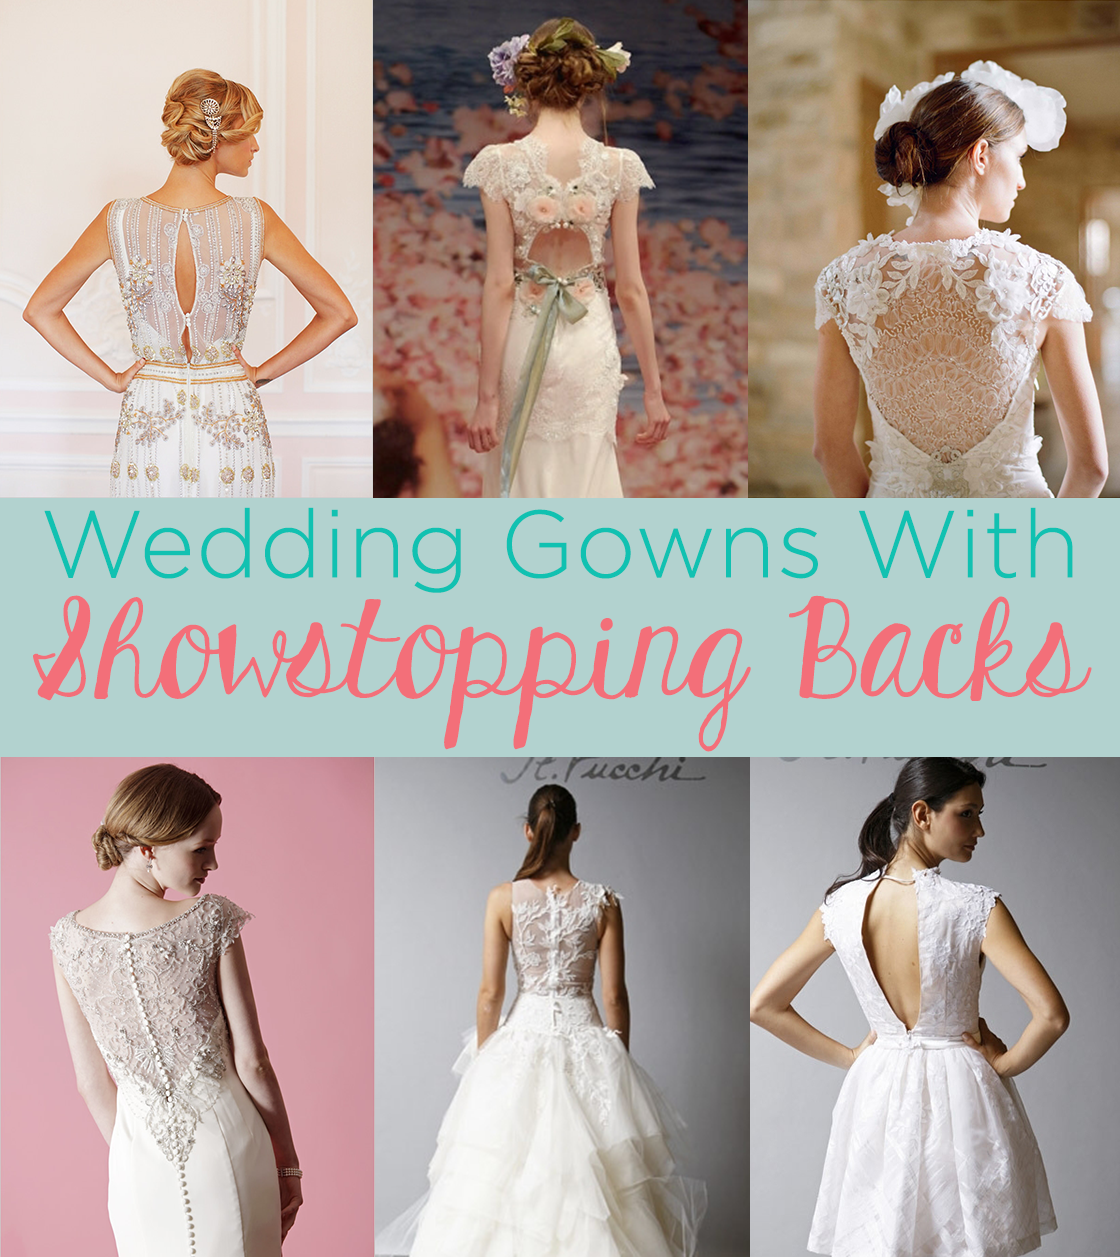 PHOTOS: The #1 Wedding Dress Trend Of 2013